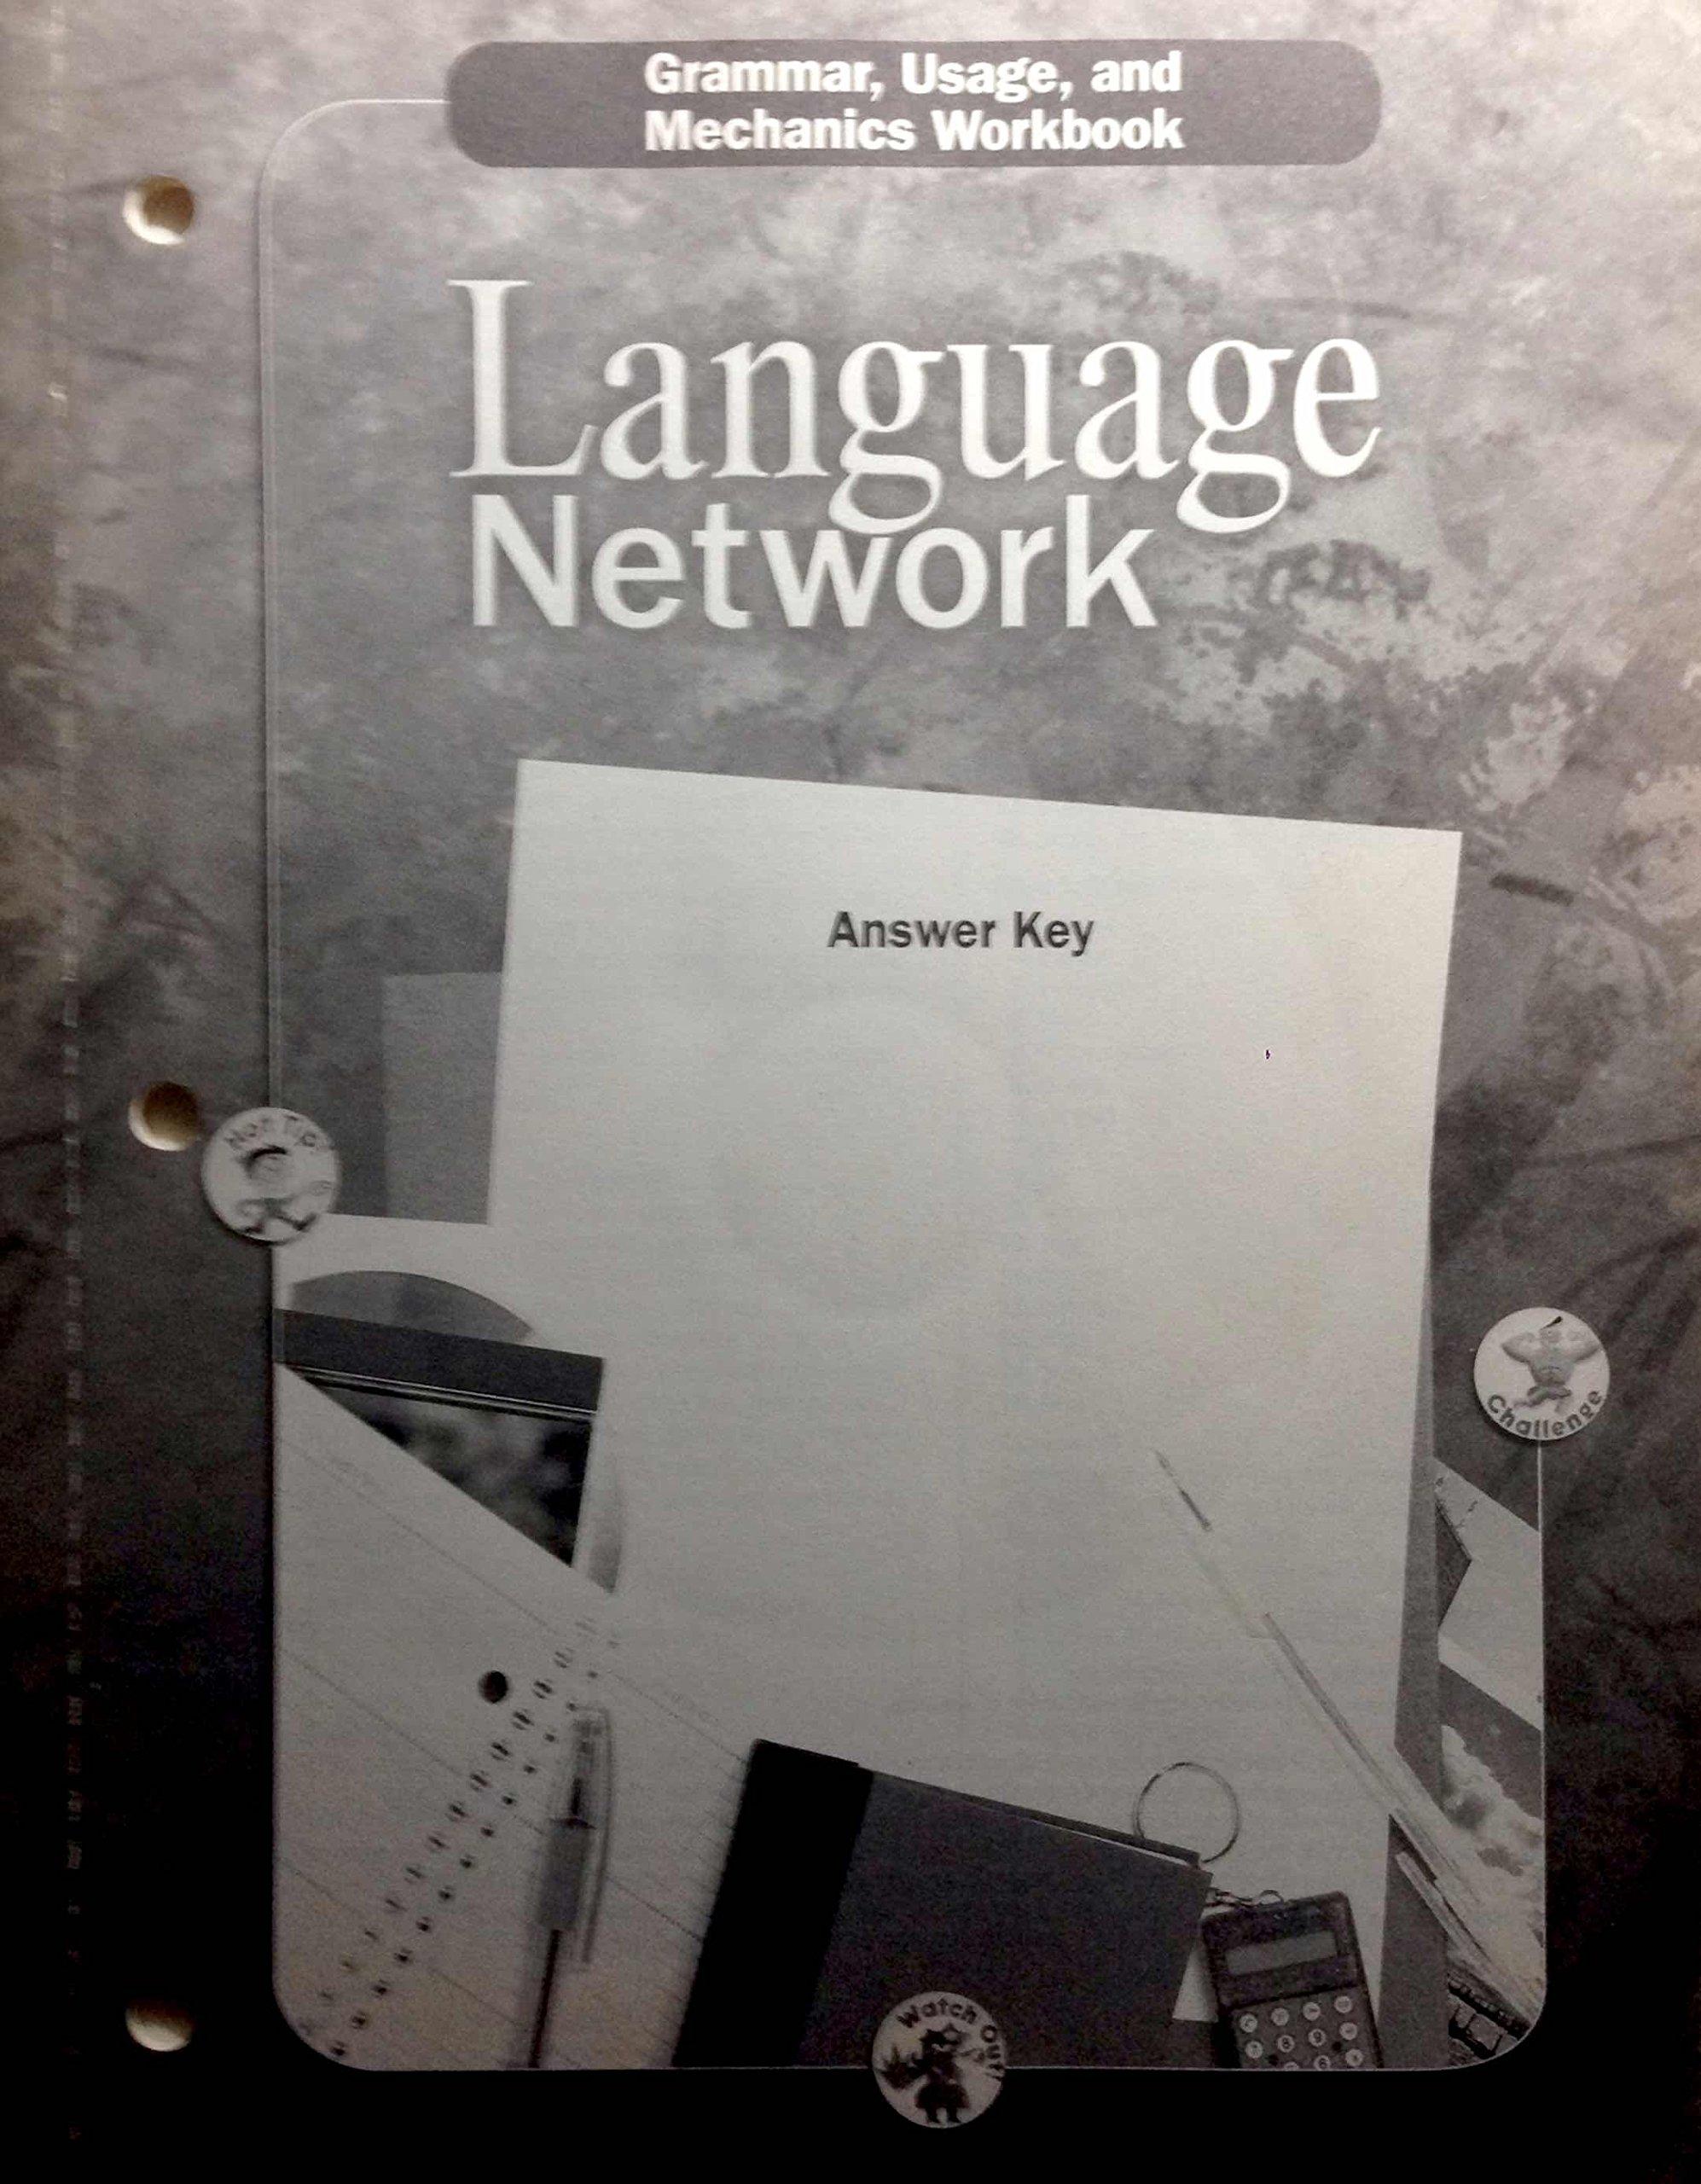 Download McDougal Littell Language Network Grade 12 Grammar, Usage and Mechanics Workbook Answer Key PDF